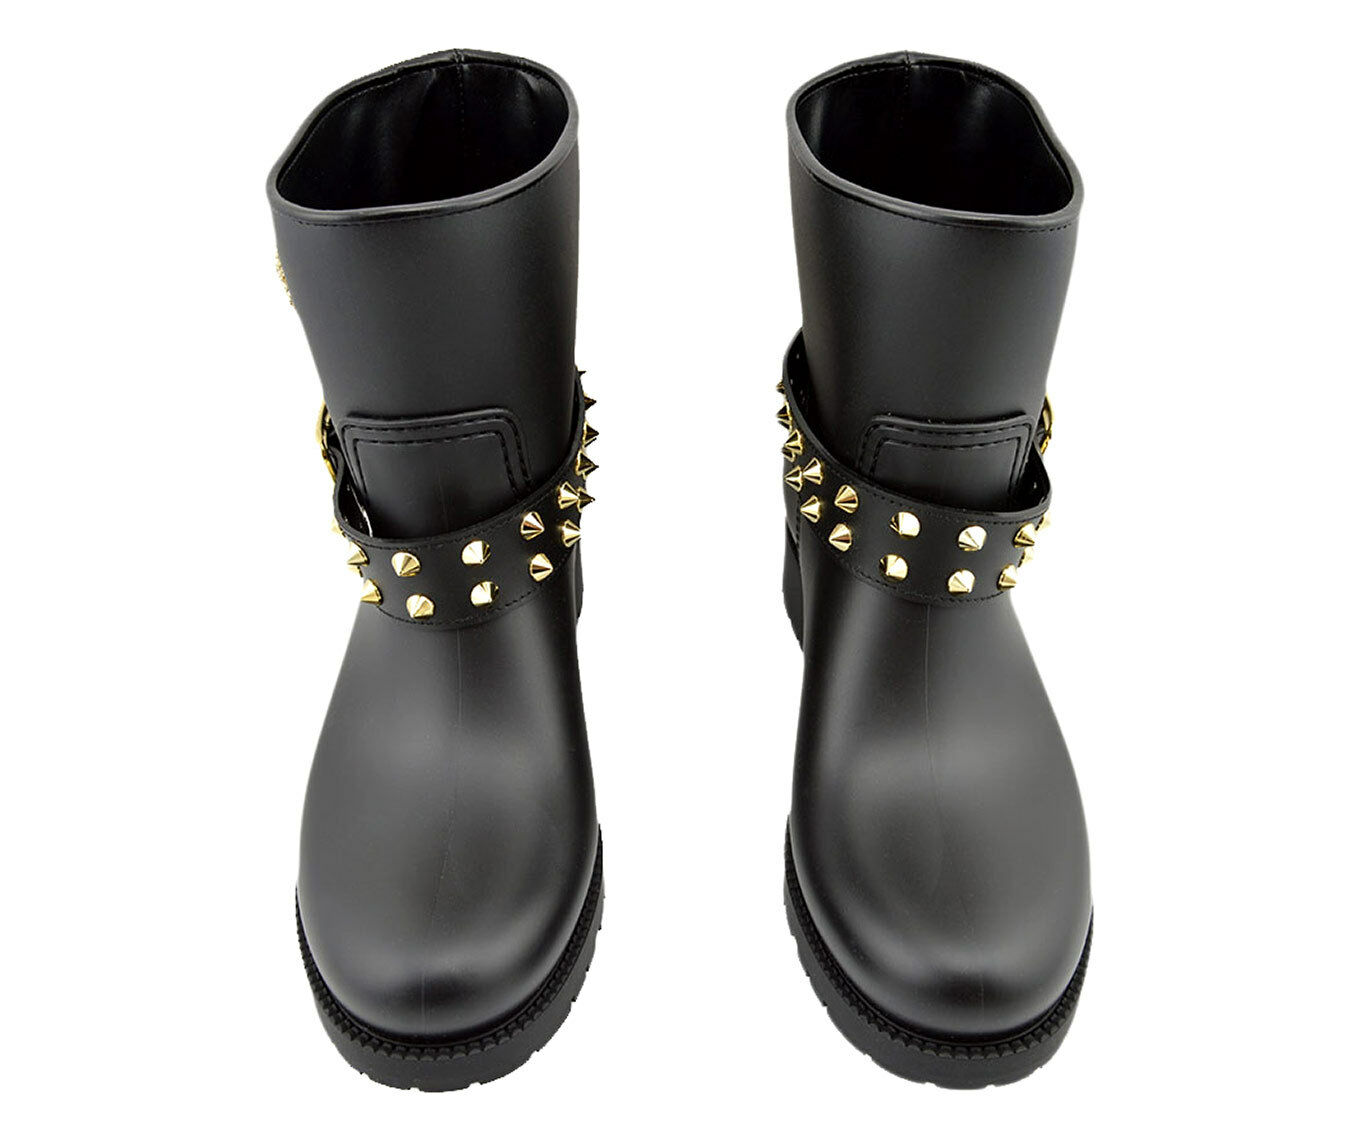 850 PHILIPP PLEIN Black Rubber  FLORIDA    Skull Rainproof Ankle Boots 40   10 4fbbc3